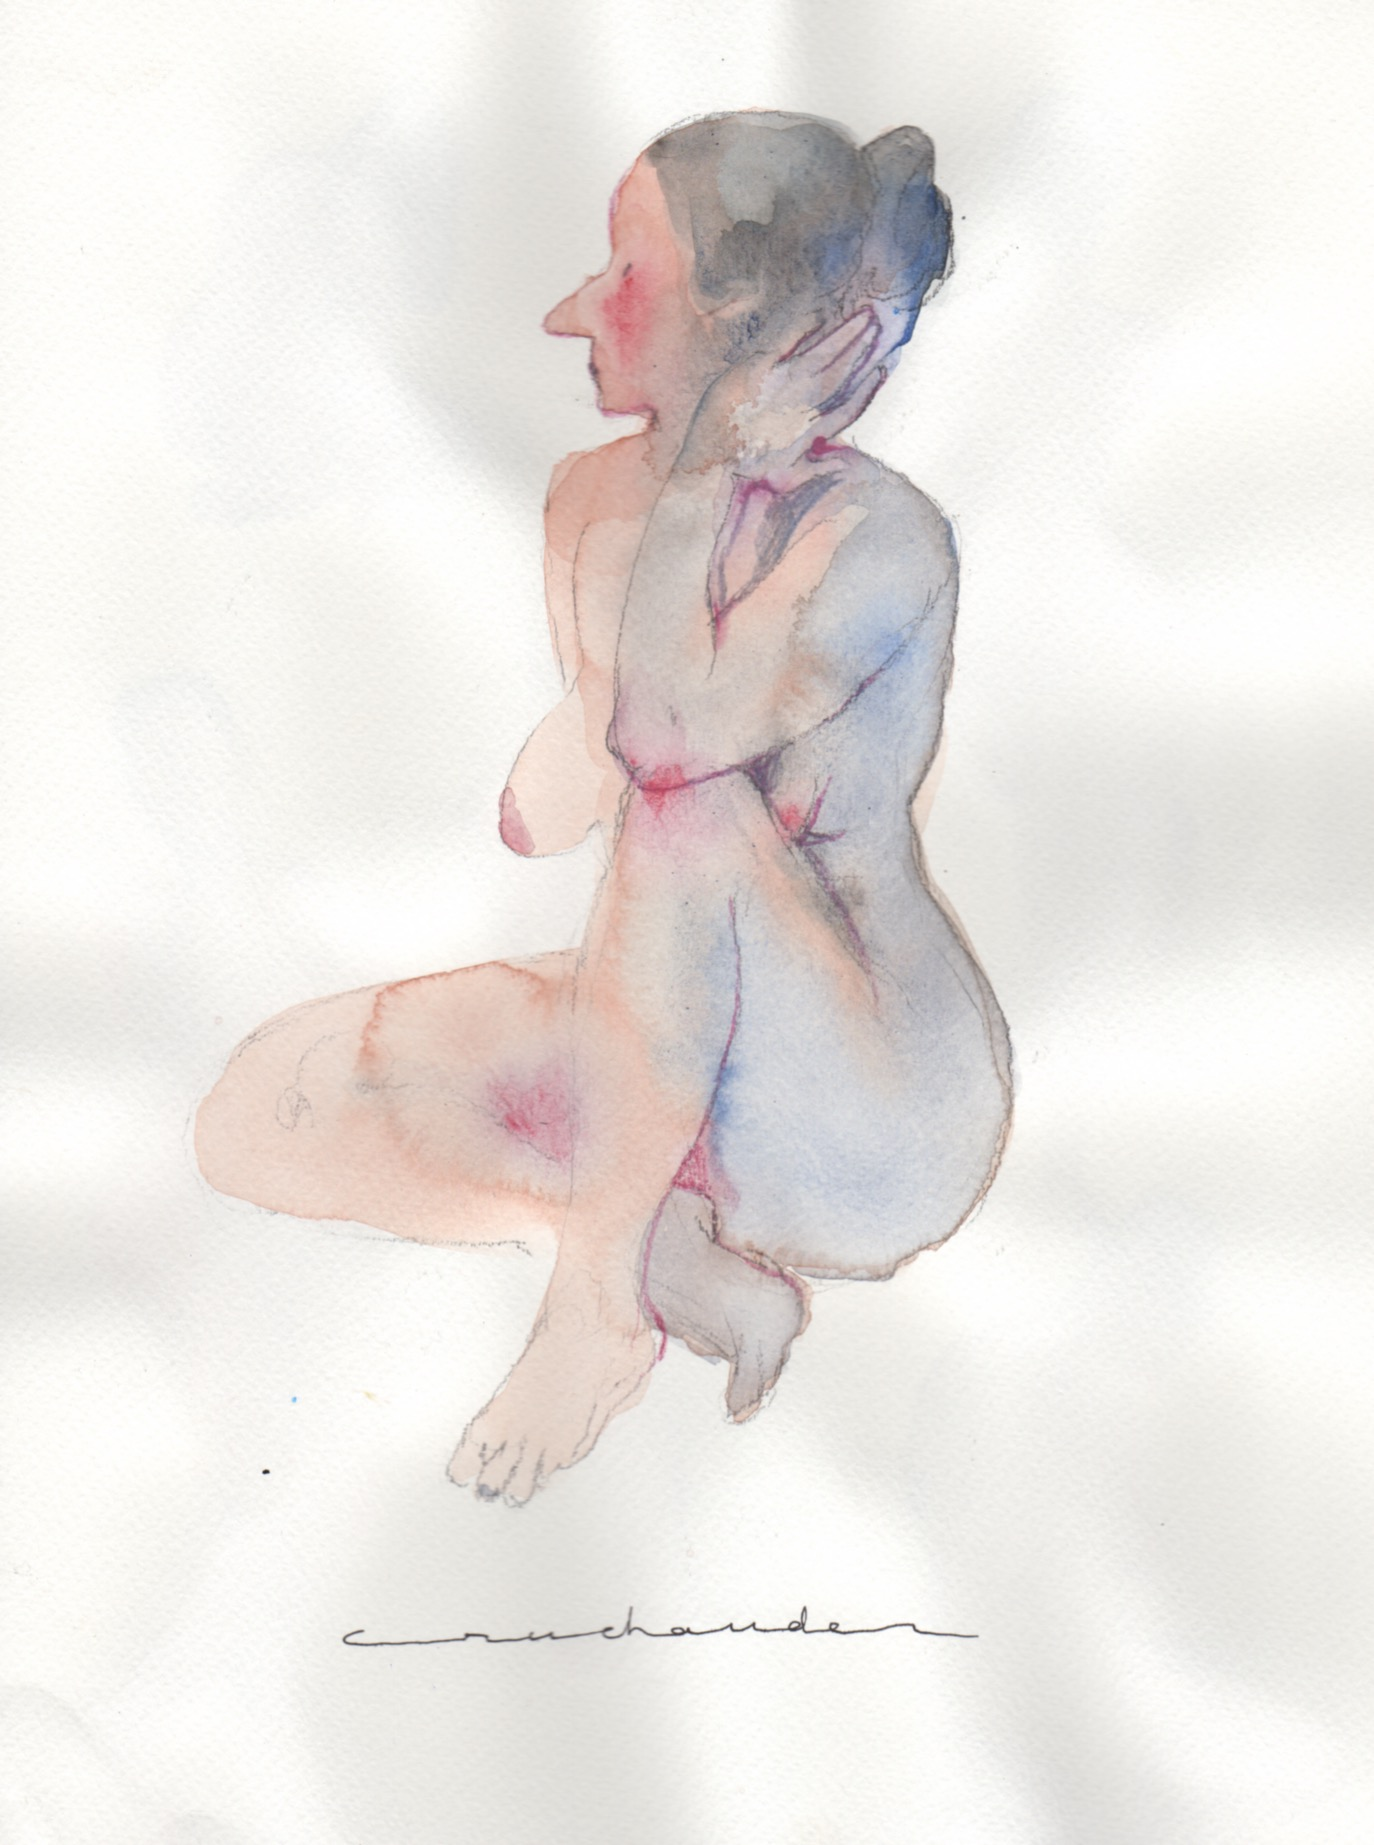 Chloé Cruchaudet | GALERIE TREIZE-DIX / NU AU PROFIL | Chloé Cruchaudet